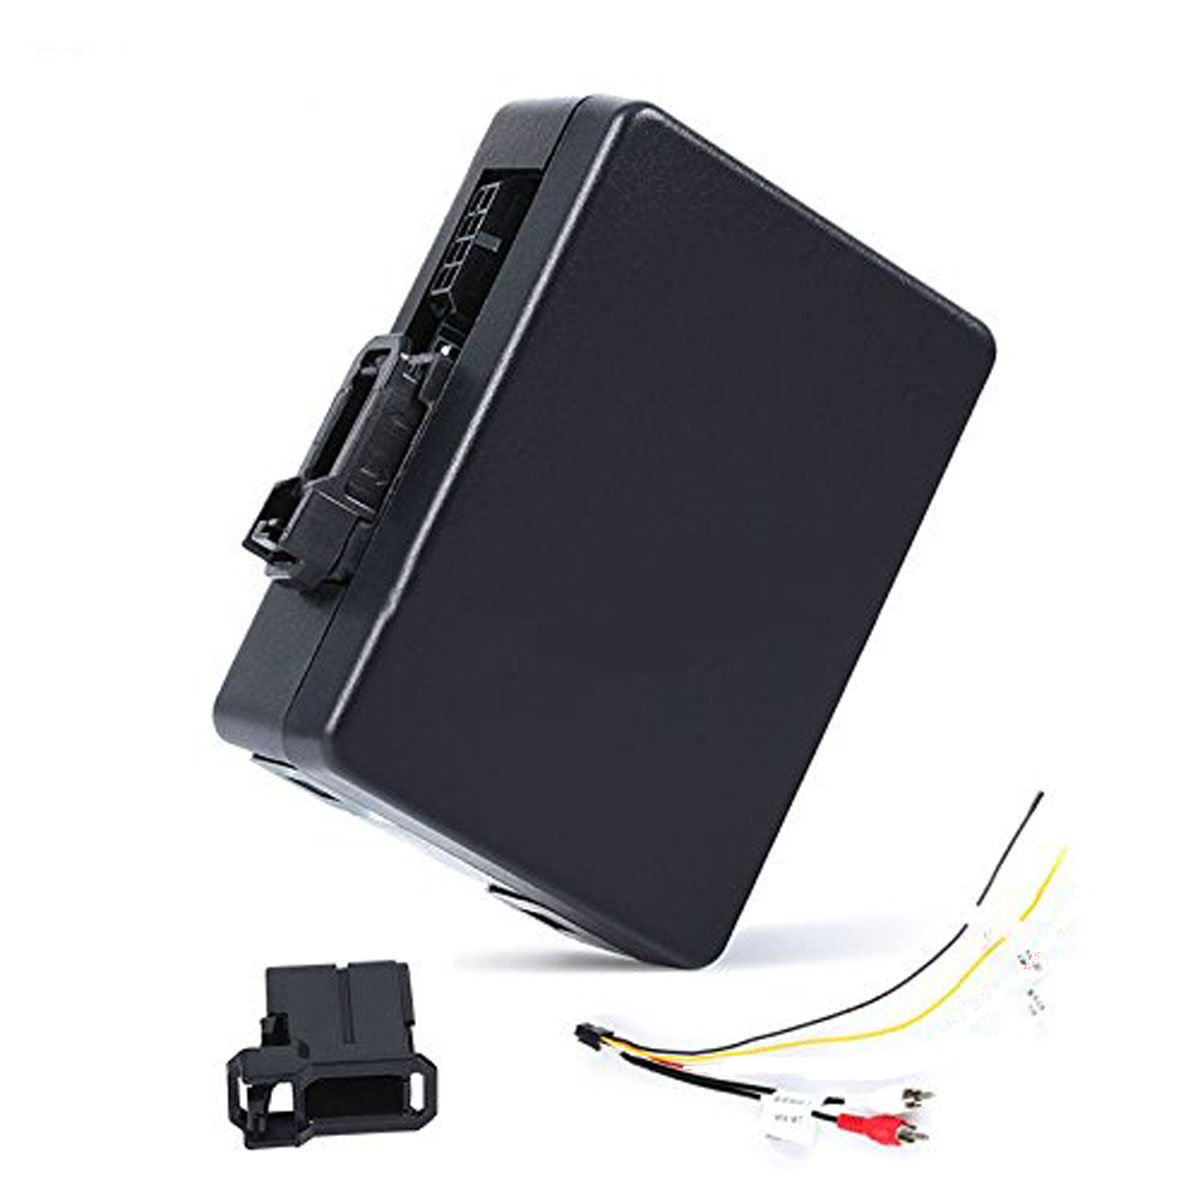 Car Stereo Radio Optical Fiber Decoder Most Box for Mercedes Benz CL/CLS/E/S/SL/SLK W211 W219